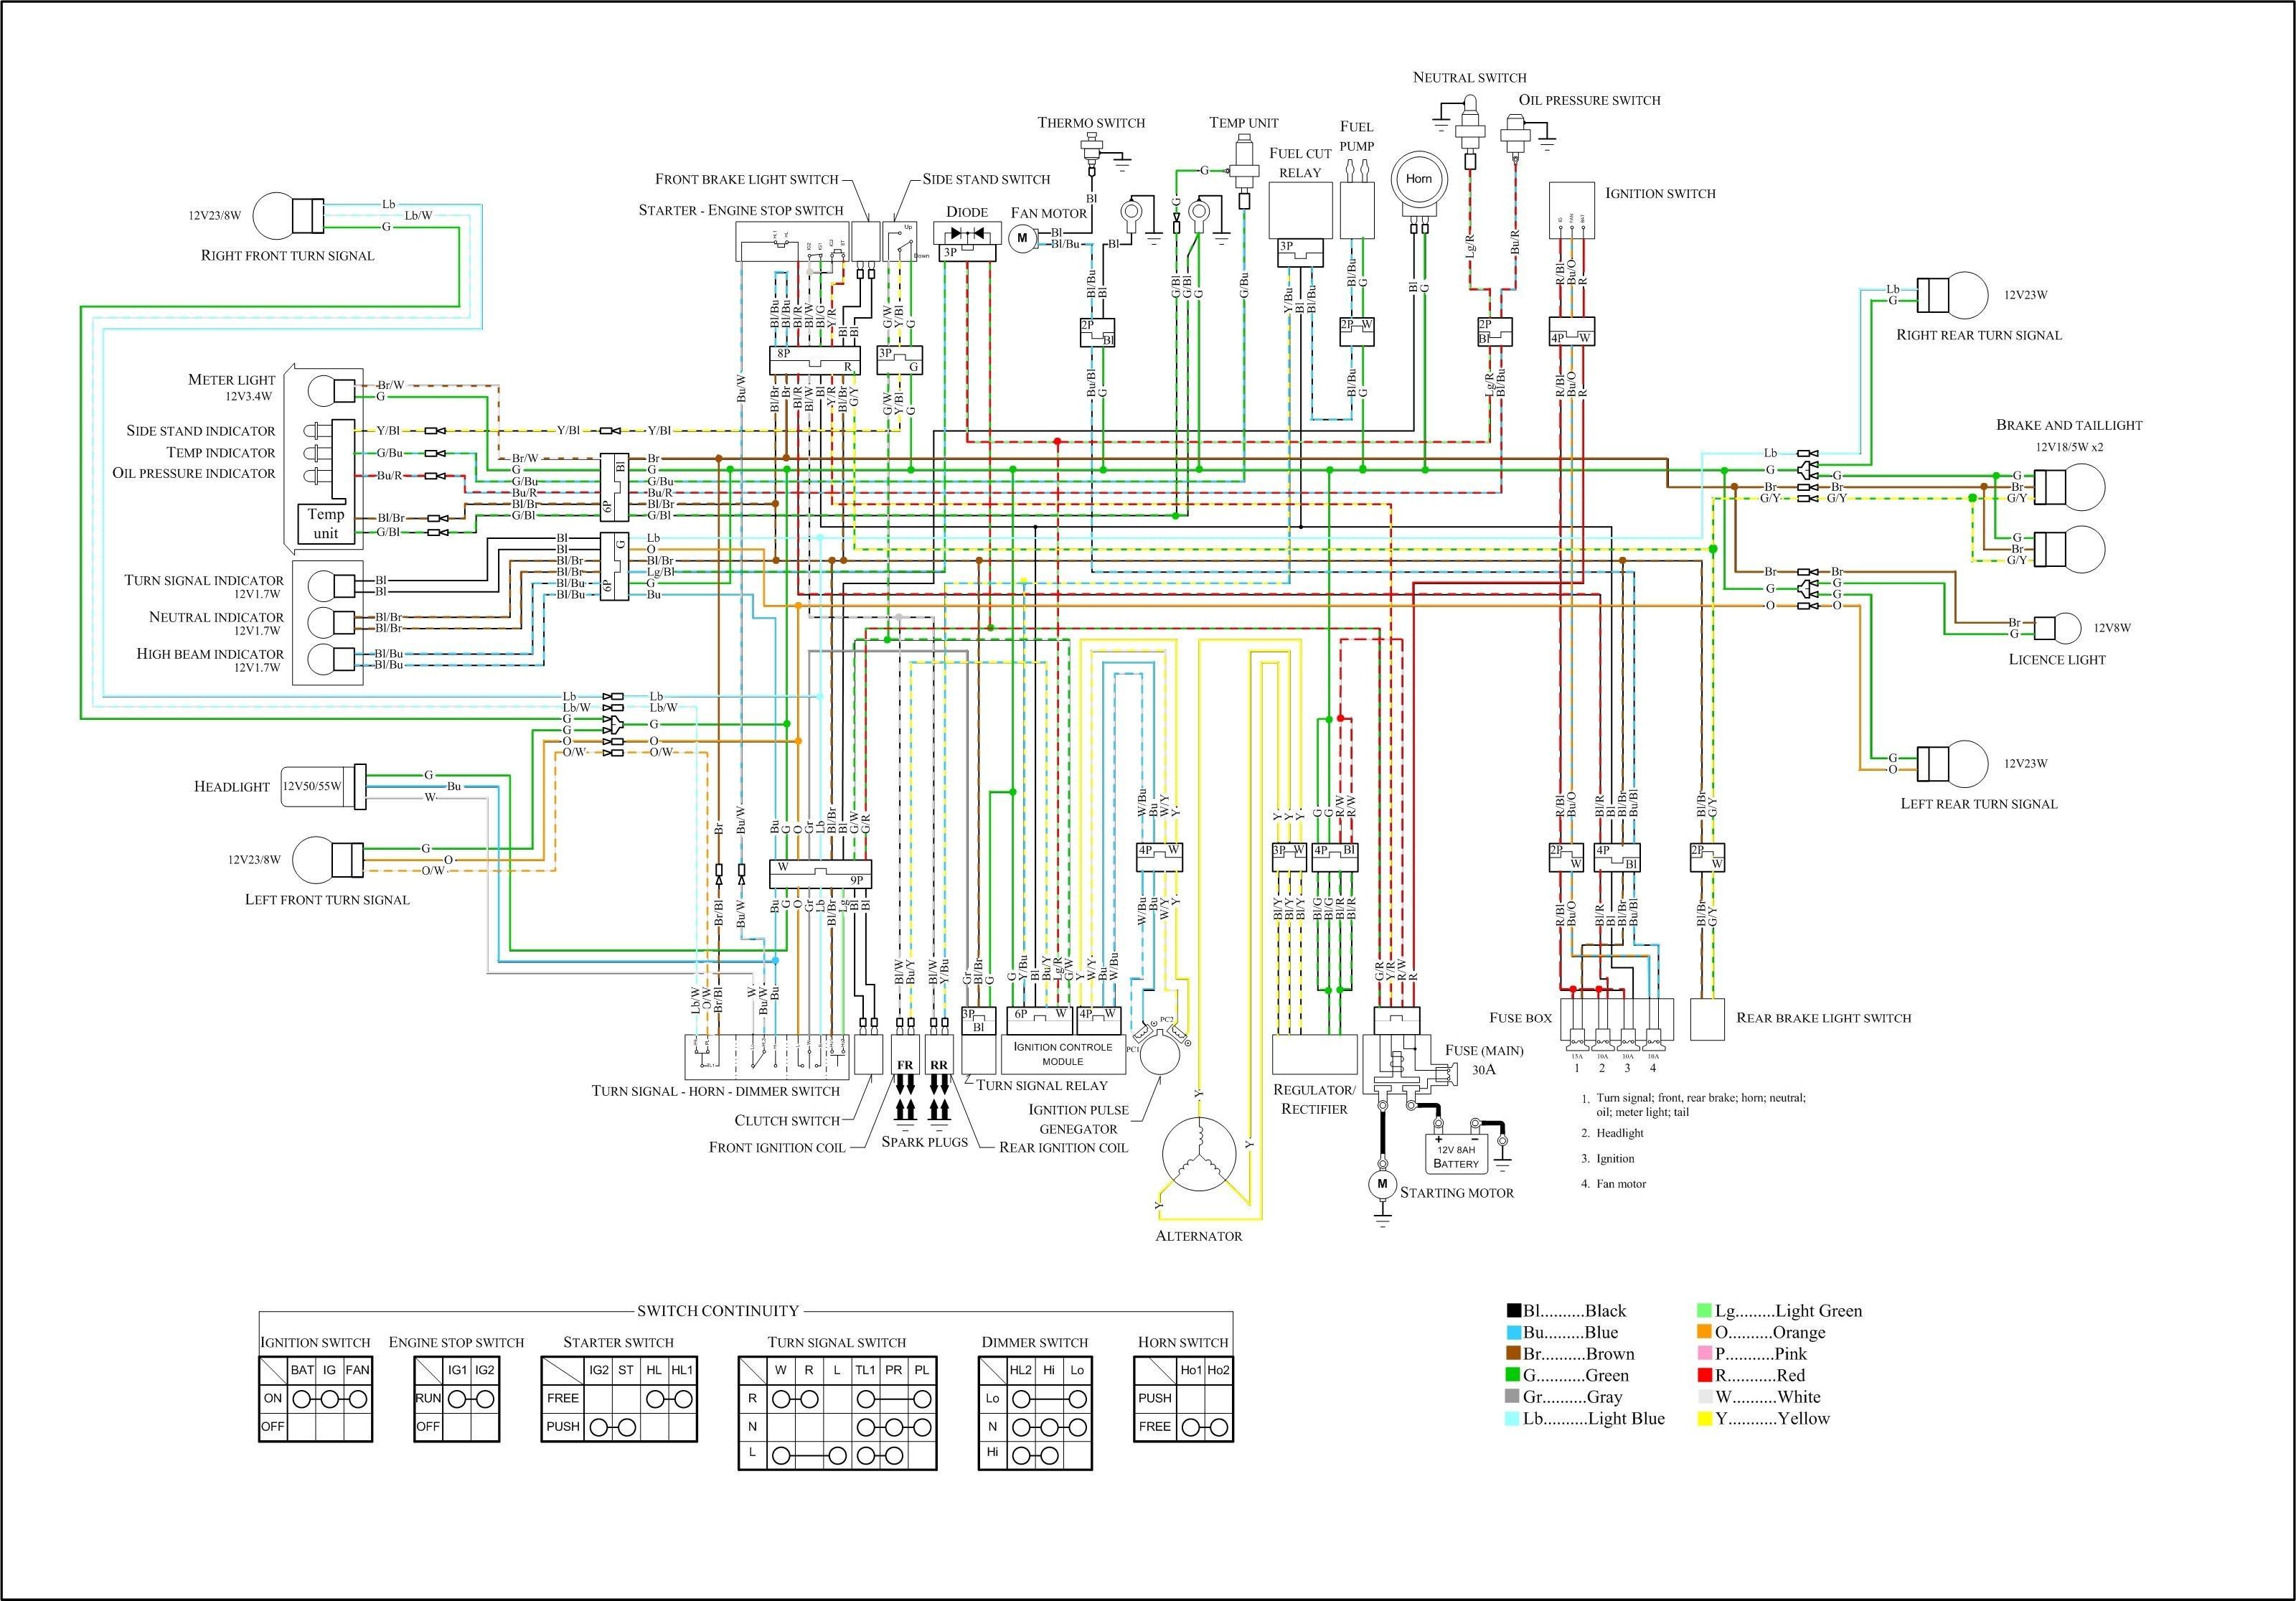 Cb400 Wiring Diagram 1100 Honda Shadow Wiring Diagram Also Honda Cb750 Wiring Diagram Of Cb400 Wiring Diagram